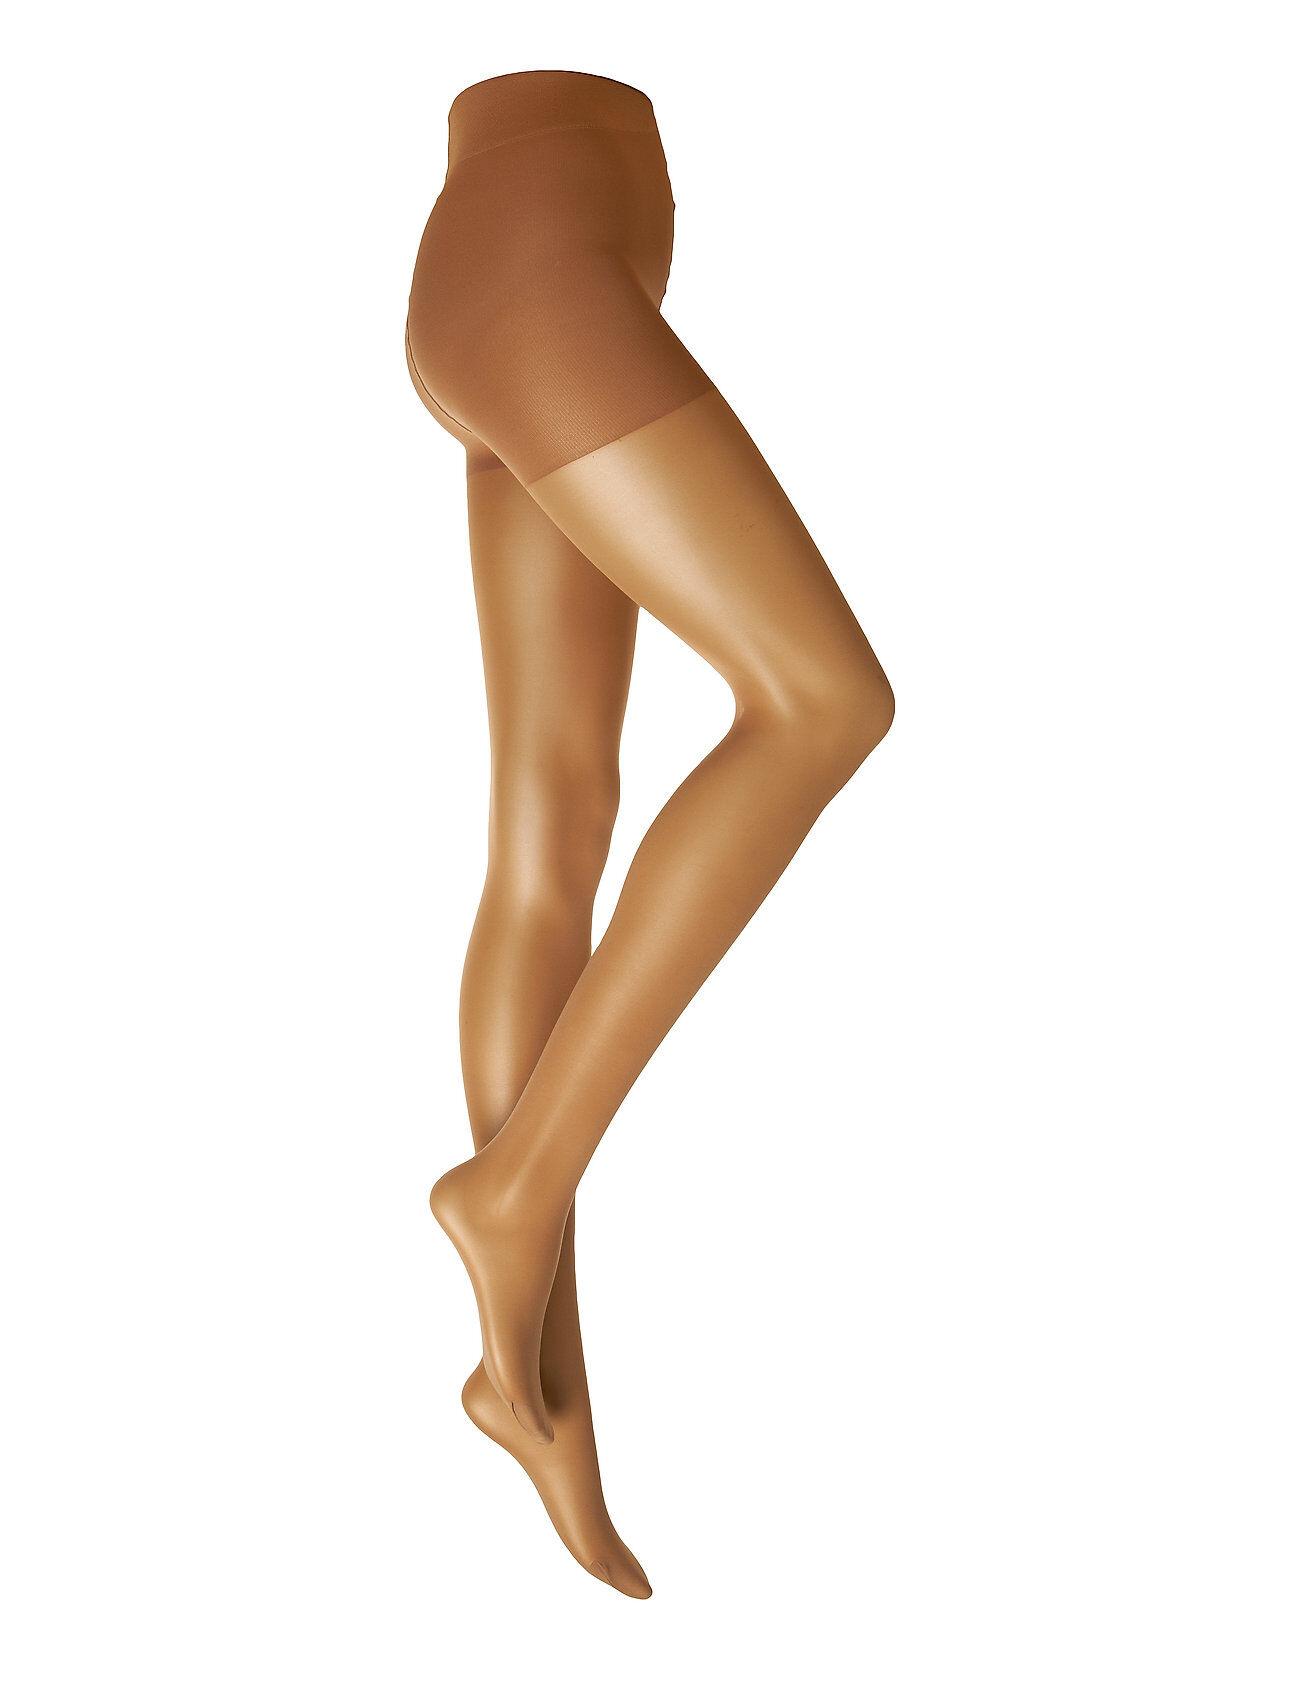 Swedish Stockings Irma Support Tights 30d Sukkahousut Beige Swedish Stockings